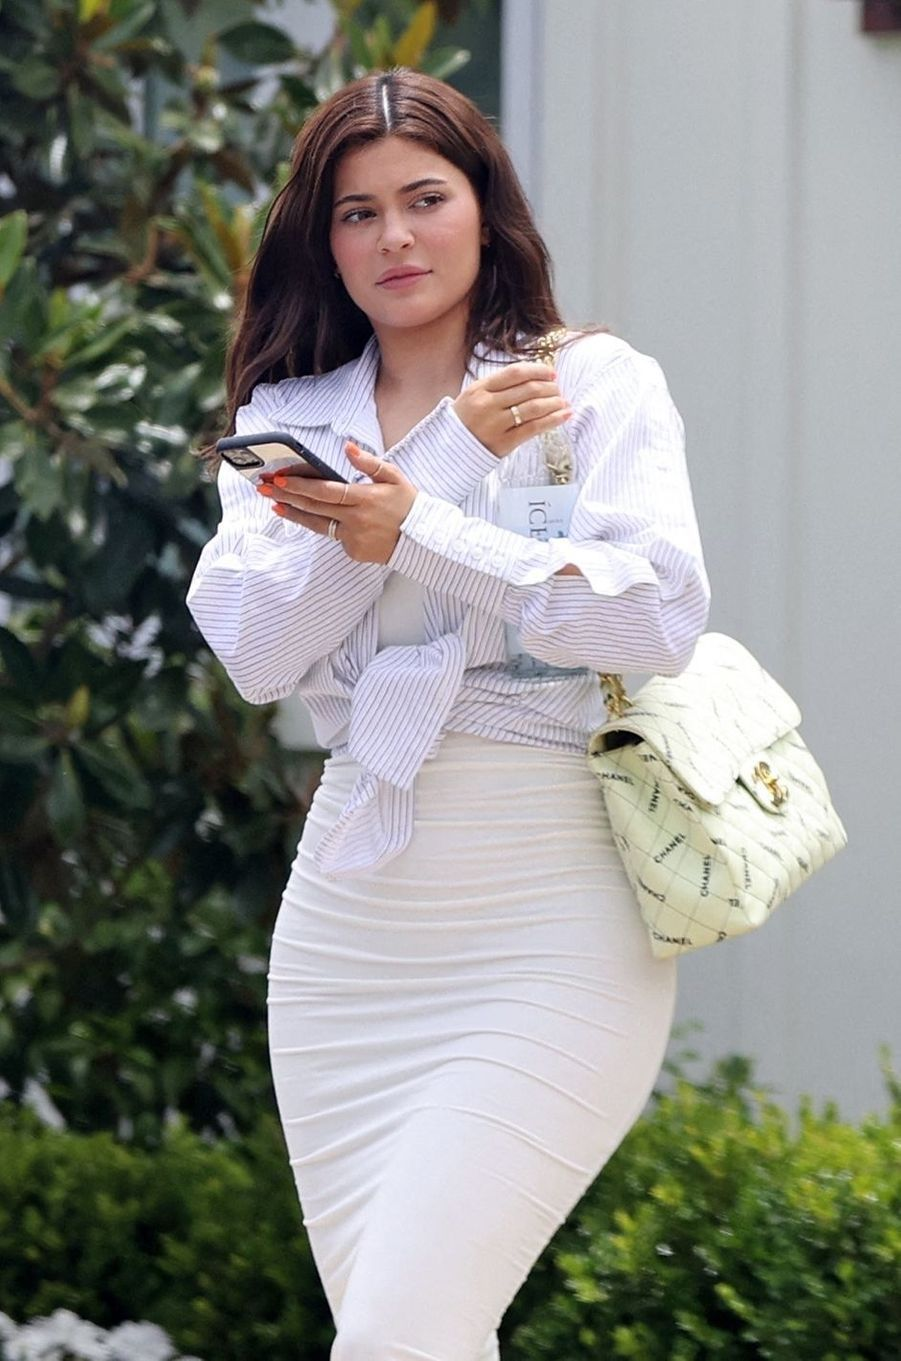 Kylie Jennerà Laguna Beach le 19 juillet 2020